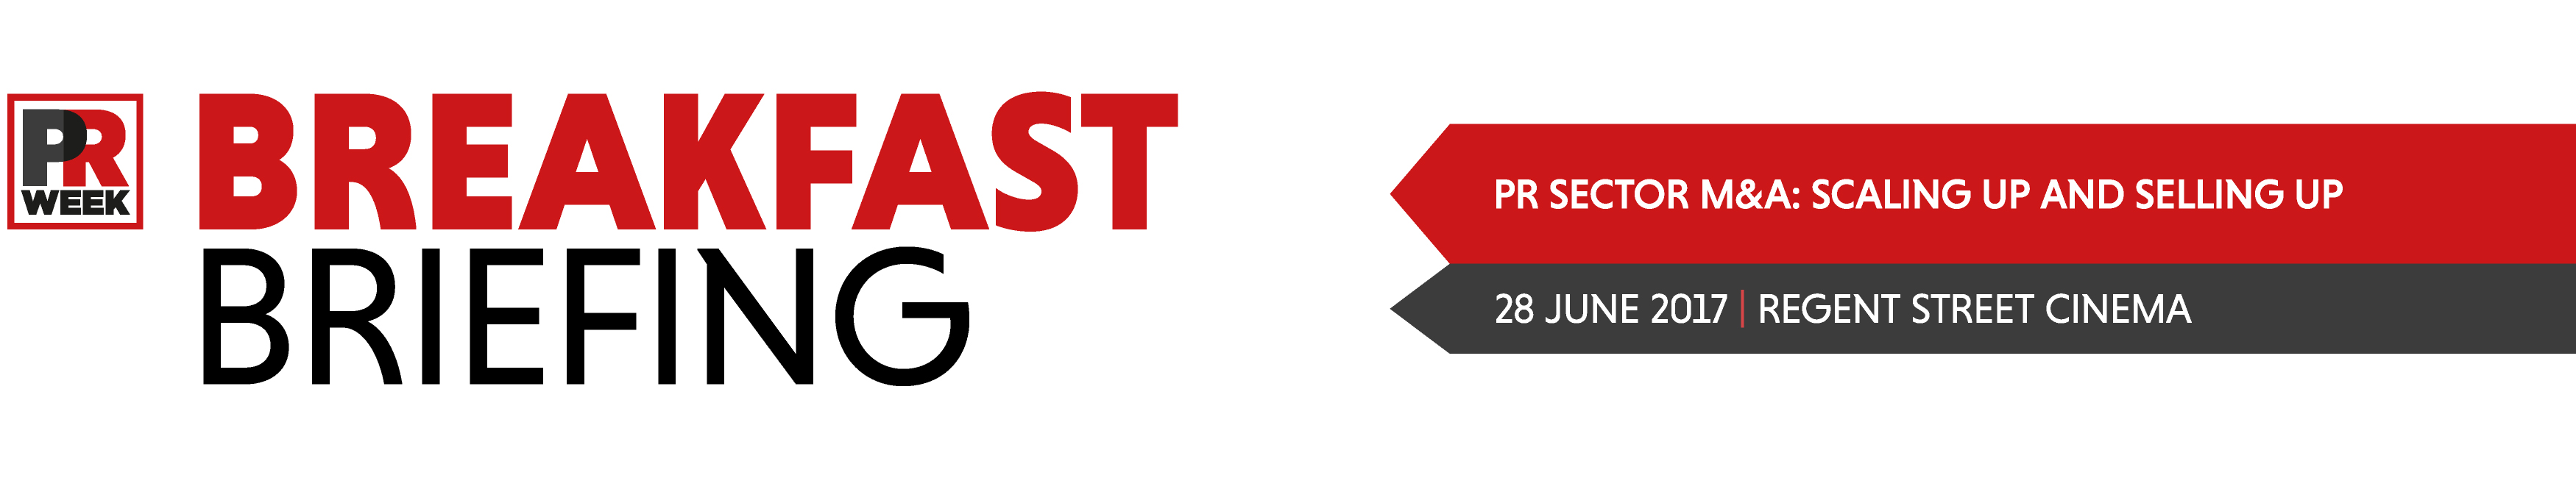 PRWeek Breakfast Briefing - PR Sector M&A